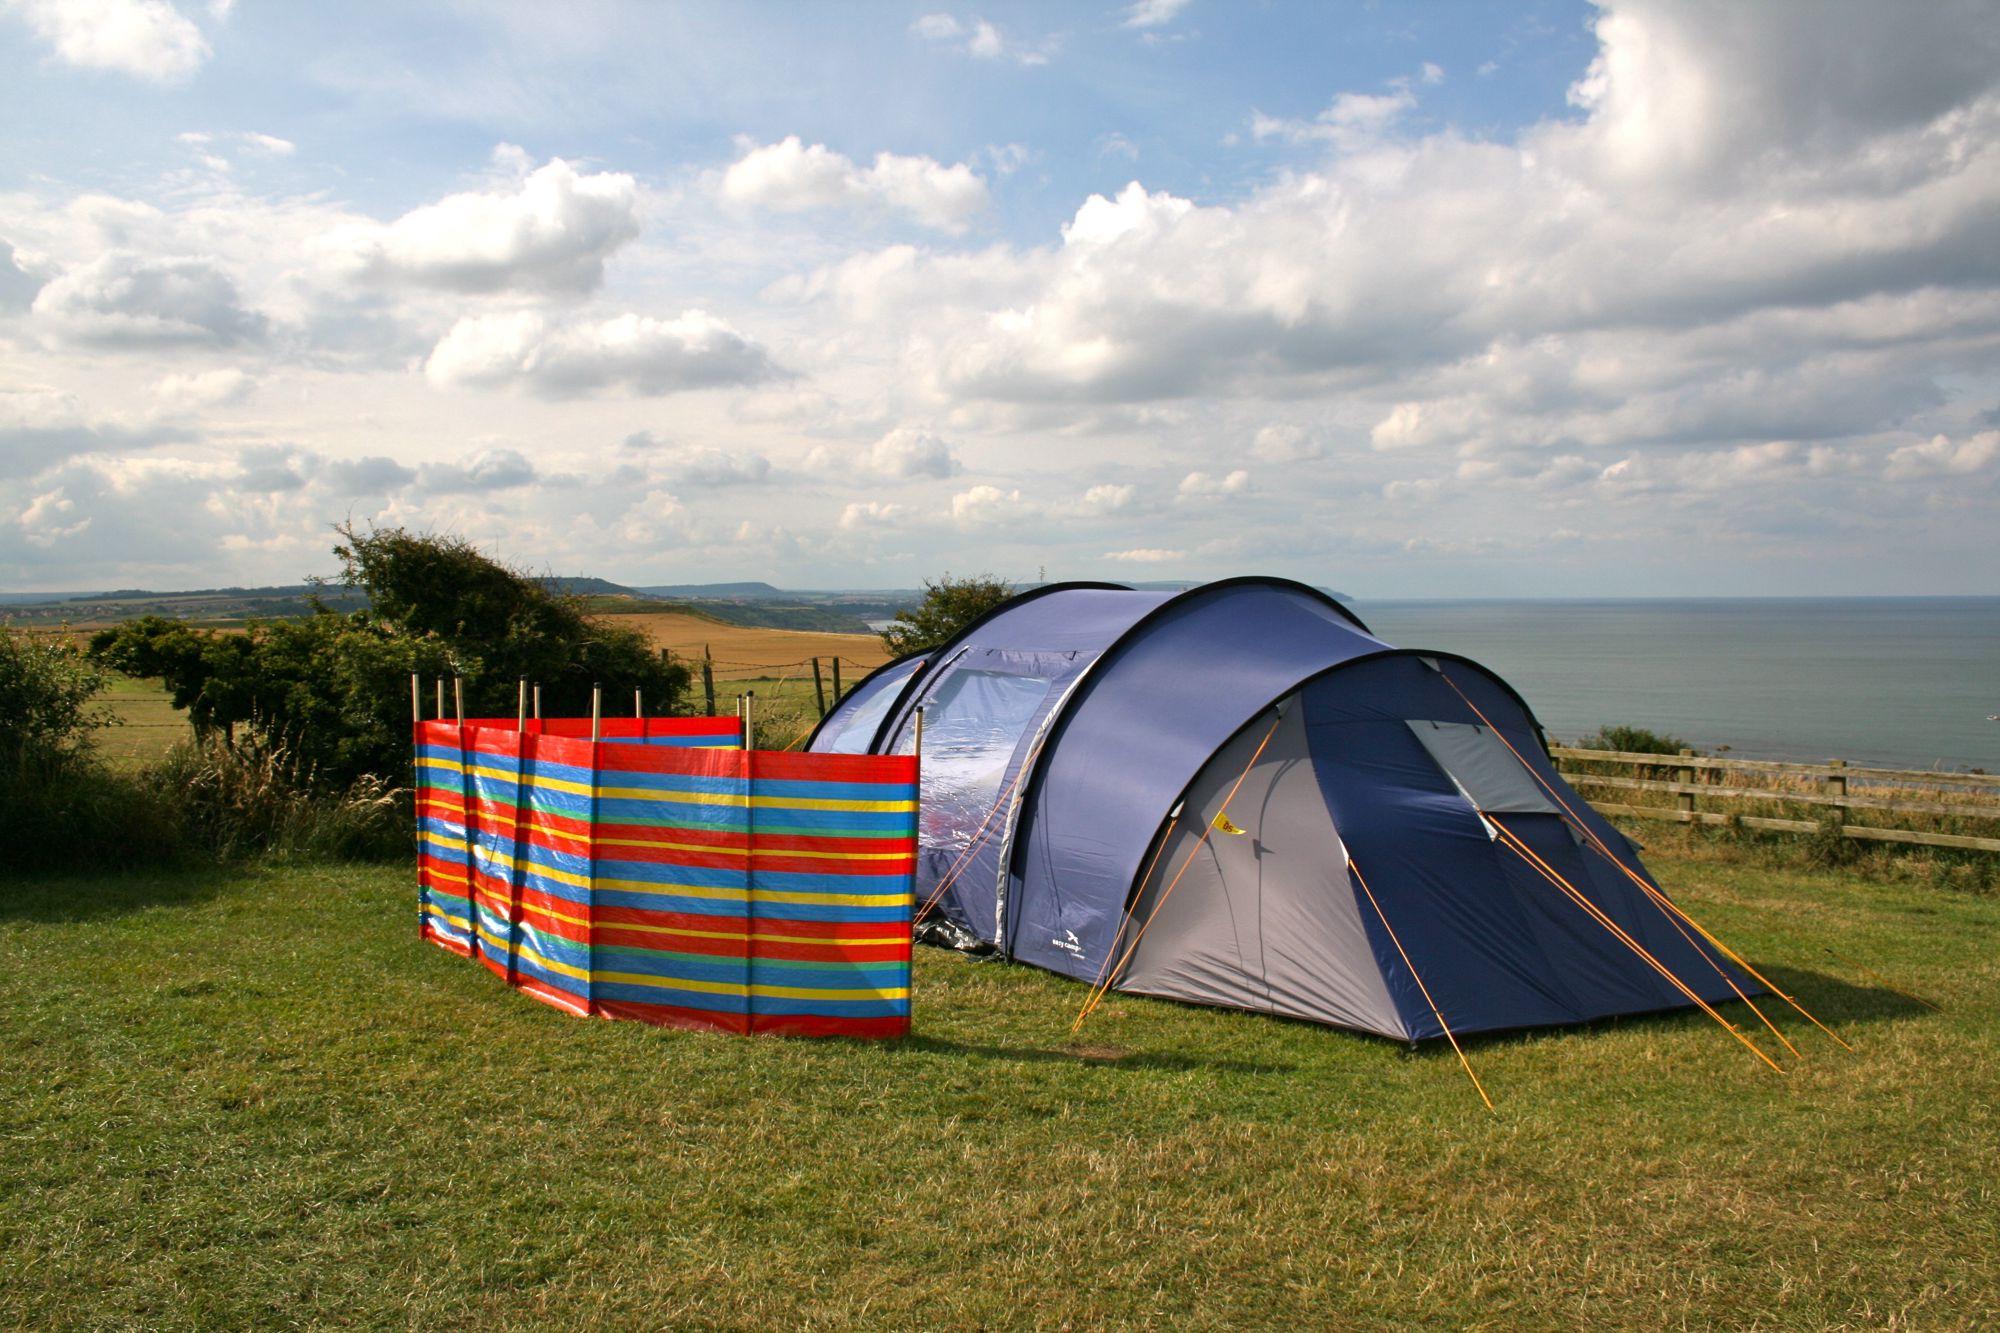 Campsites in Yorkshire